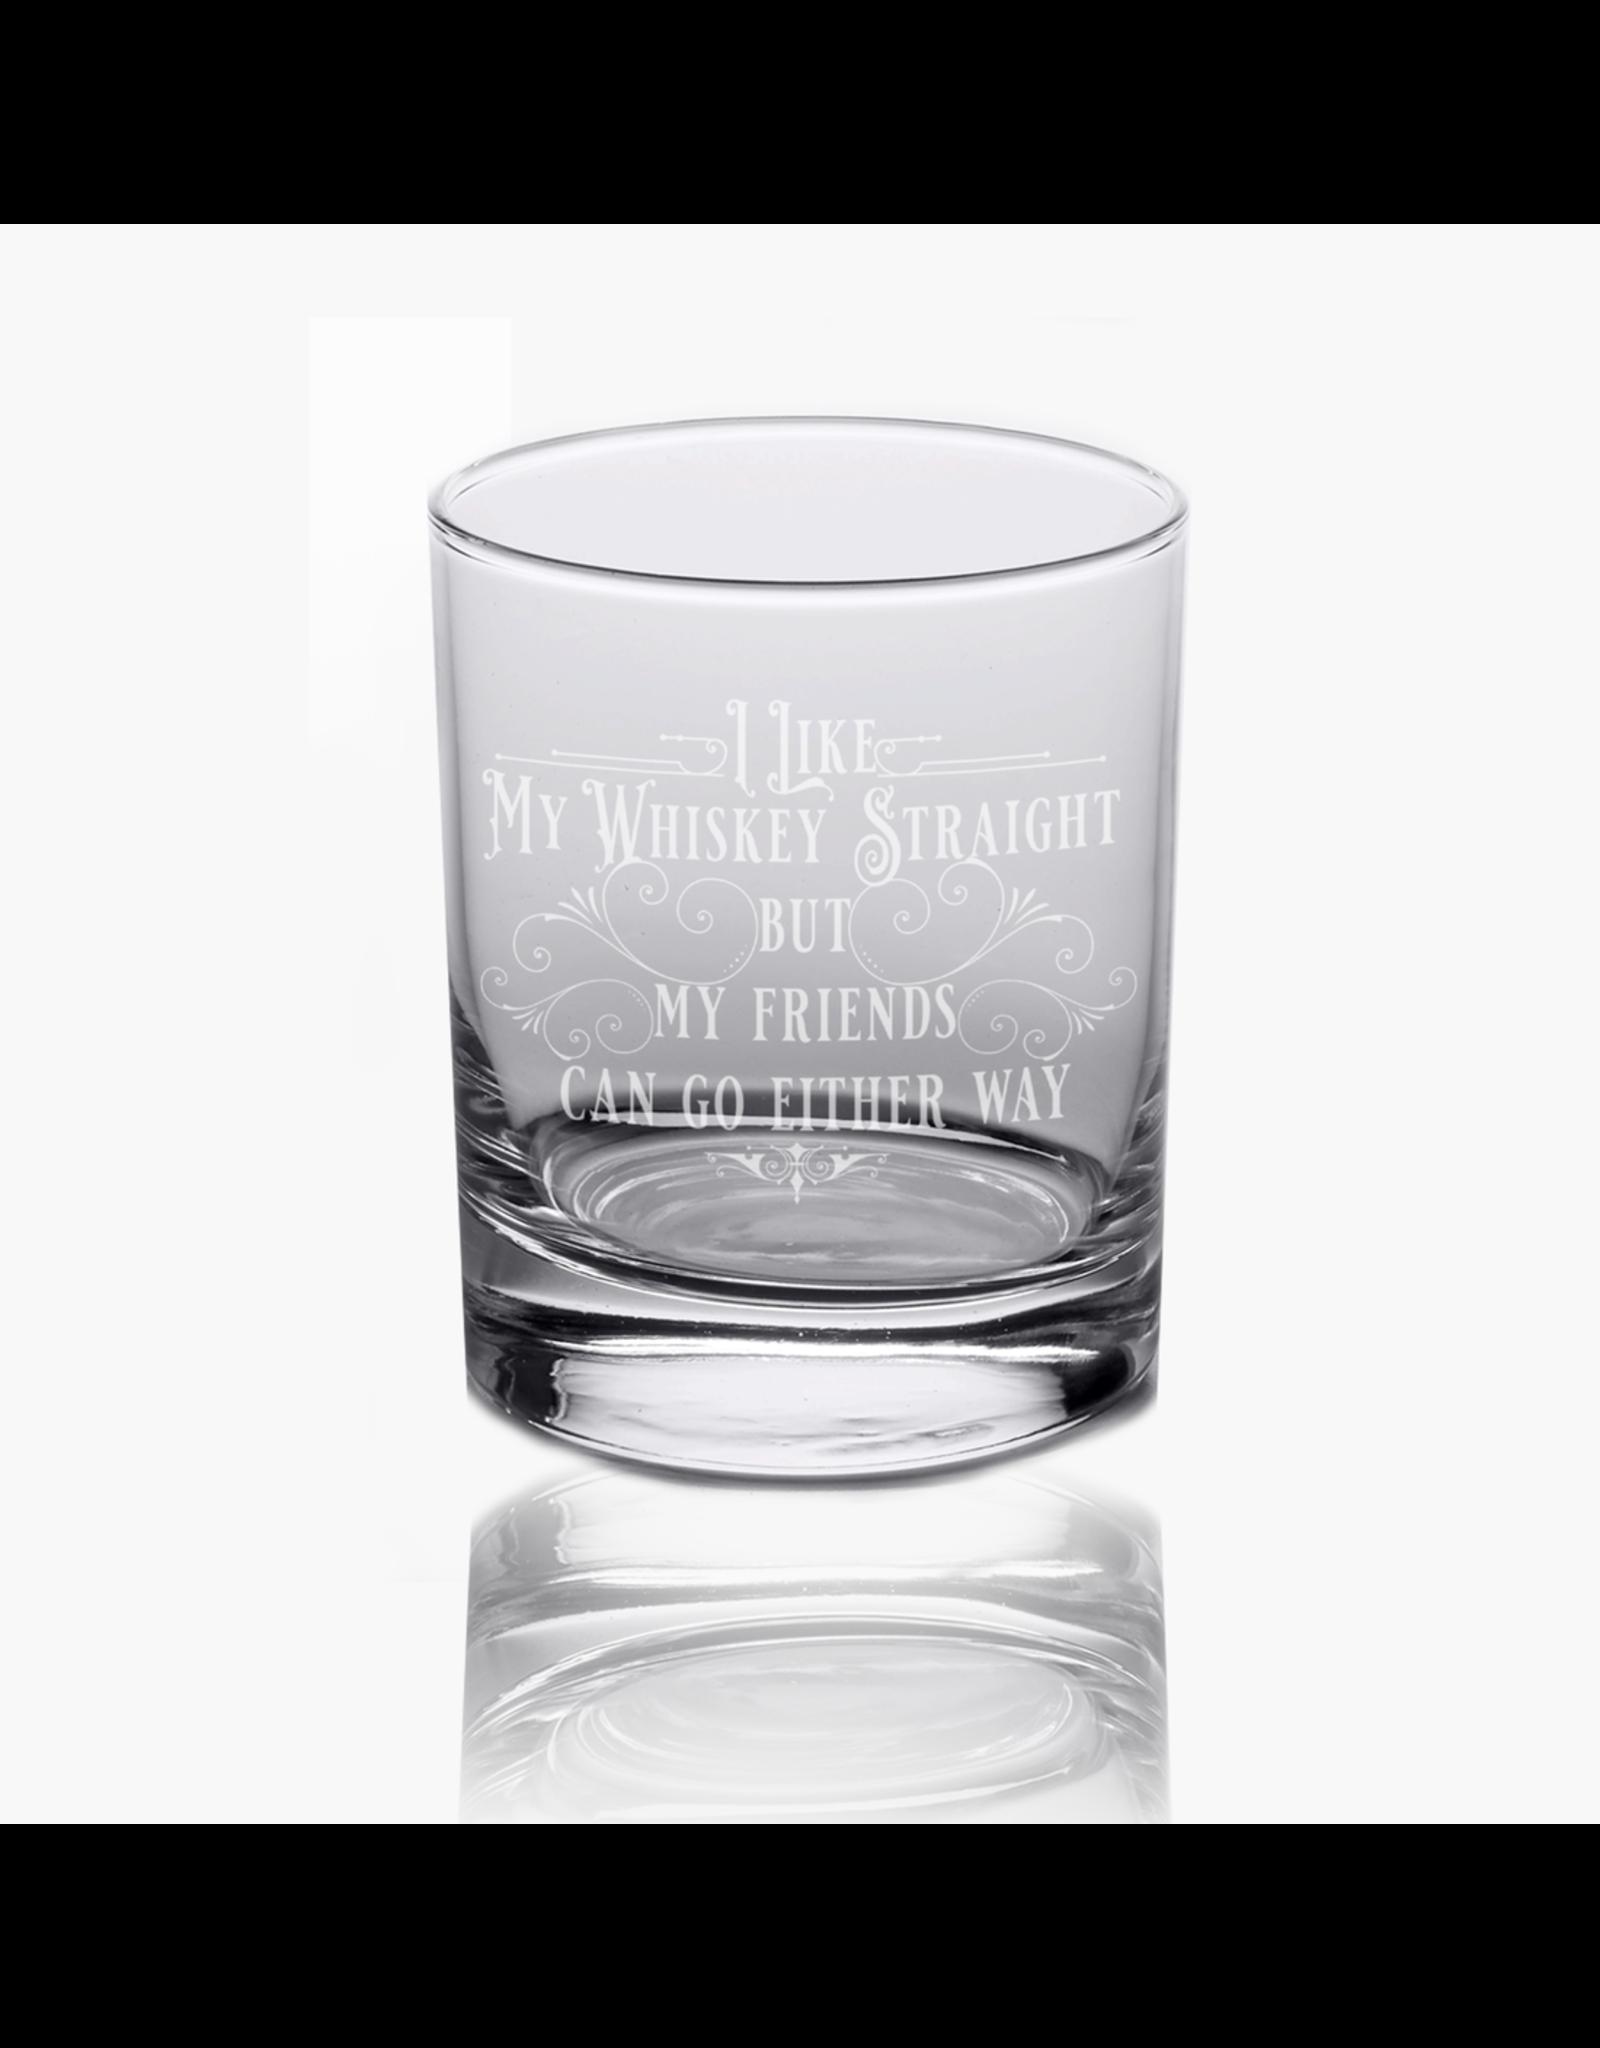 Calm Down Caren Rocks Glass - I Like My Whiskey Straight But My Friends